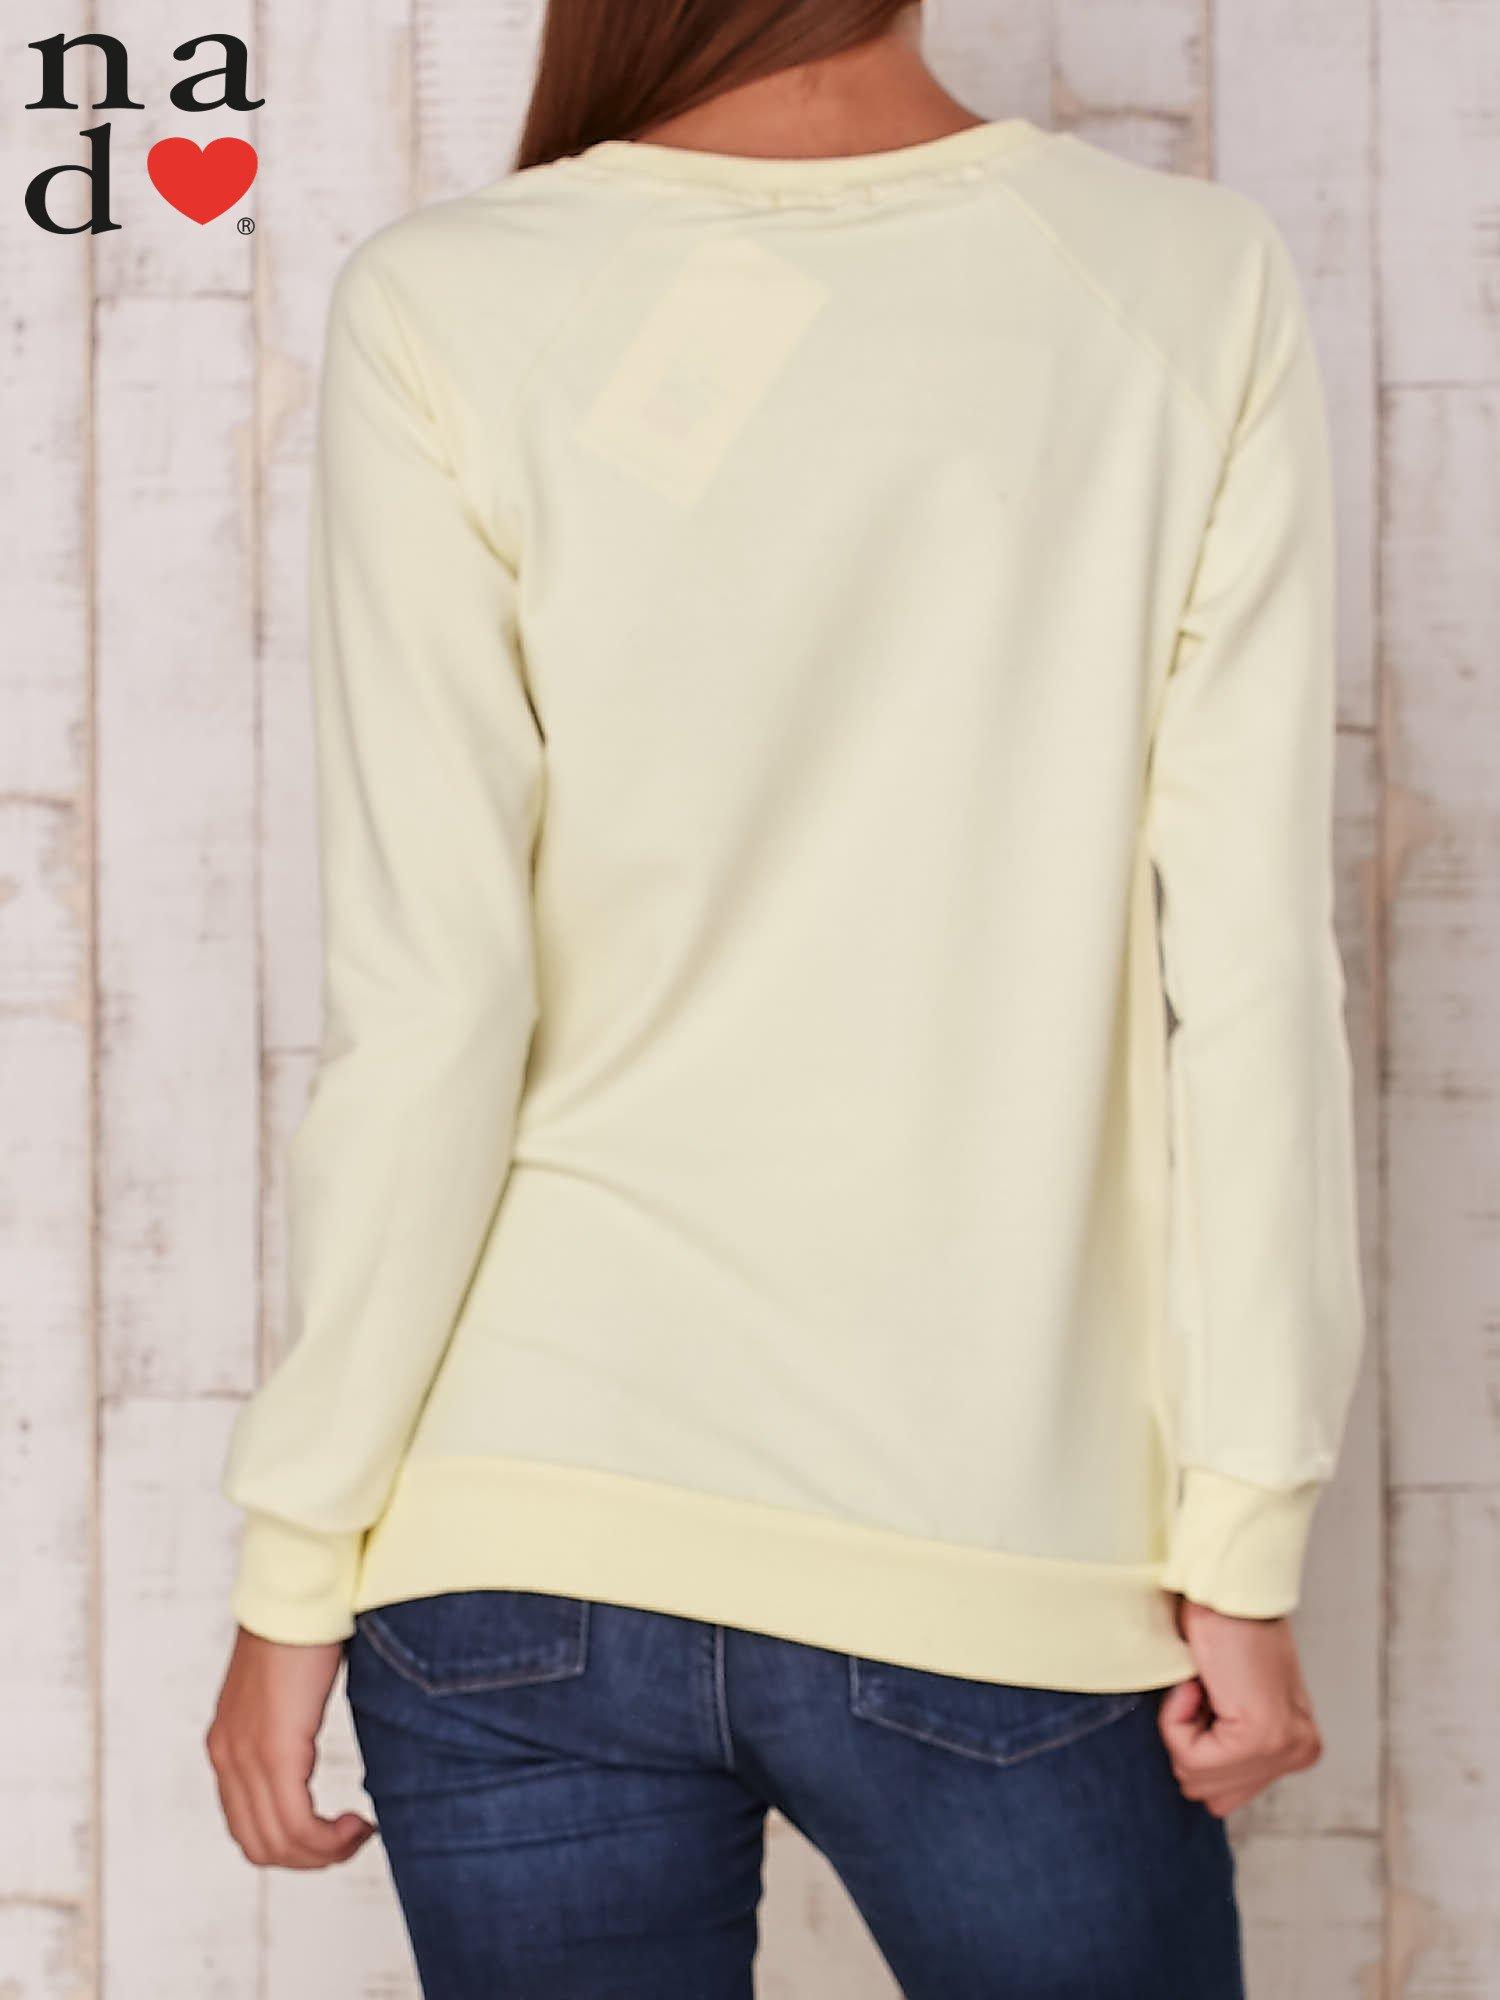 Żółta bluza z nadrukiem serca                                  zdj.                                  5